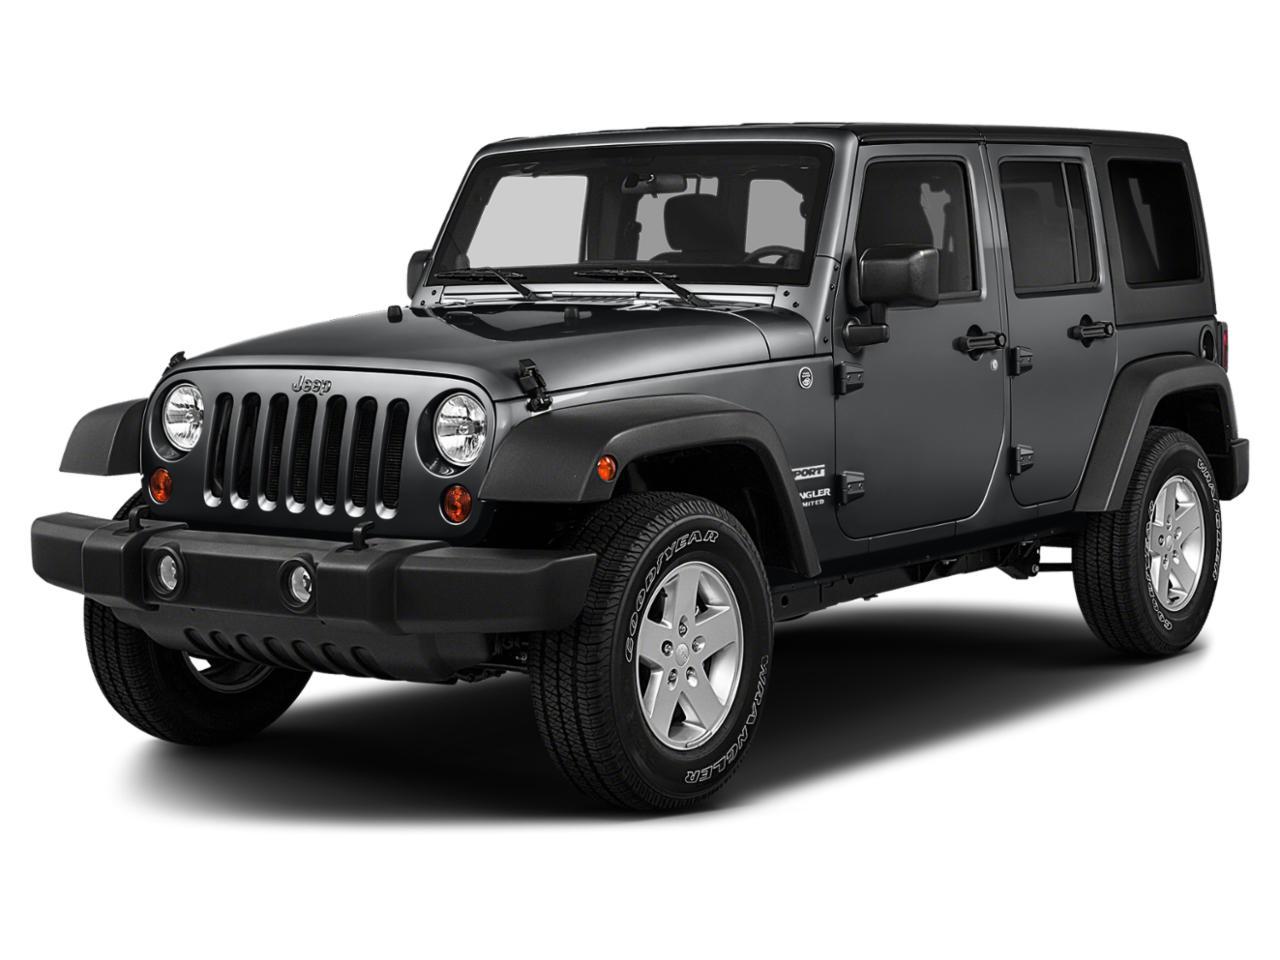 2018 Jeep Wrangler JK Unlimited Vehicle Photo in Columbia, TN 38401